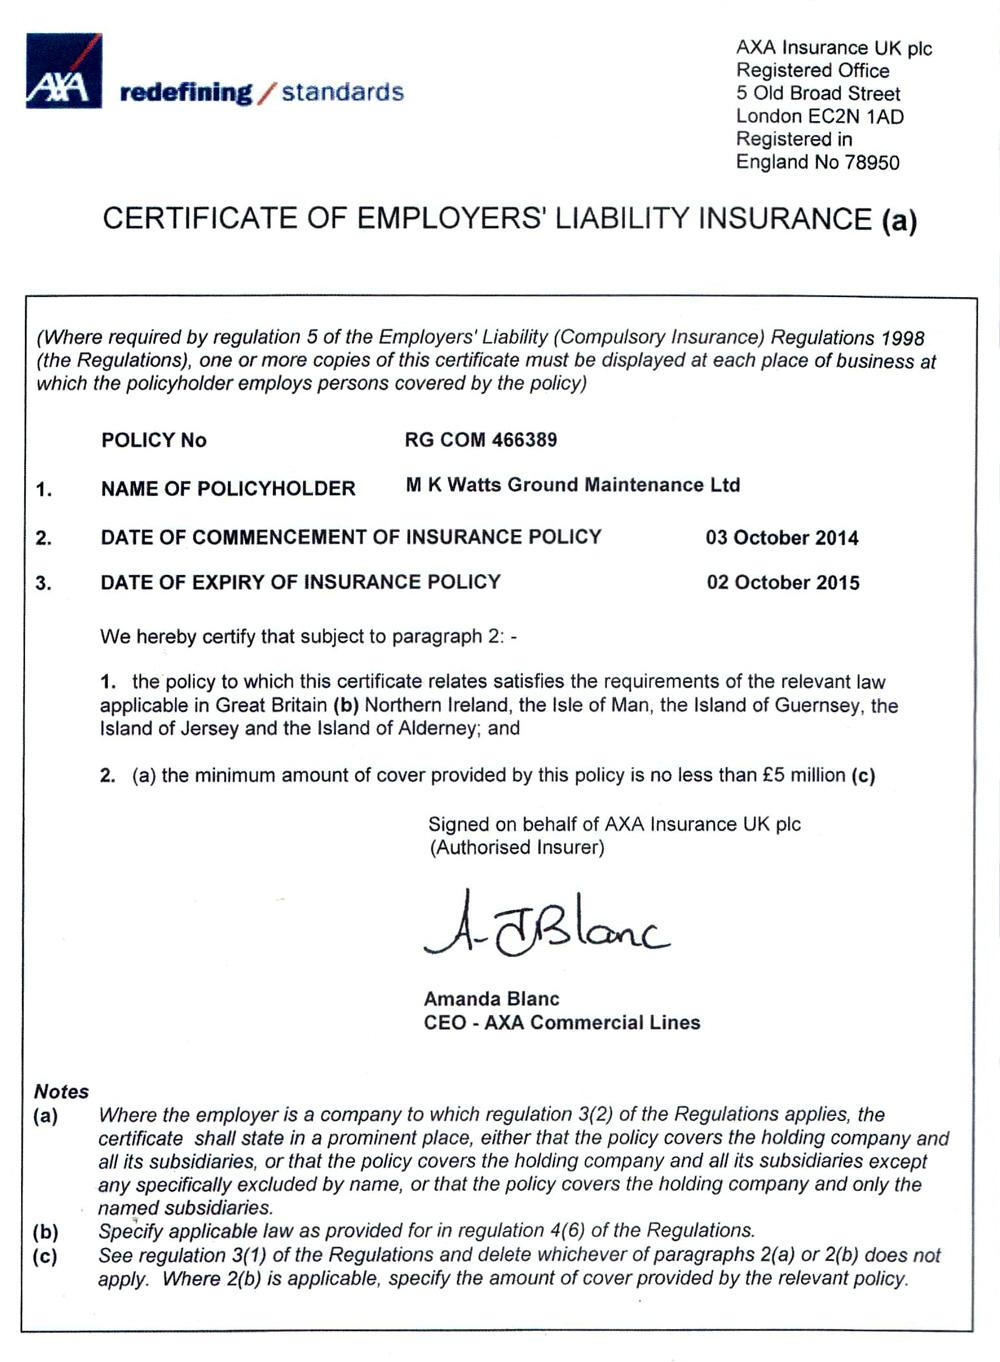 Insurance-Document-2015to2015--no1.jpg